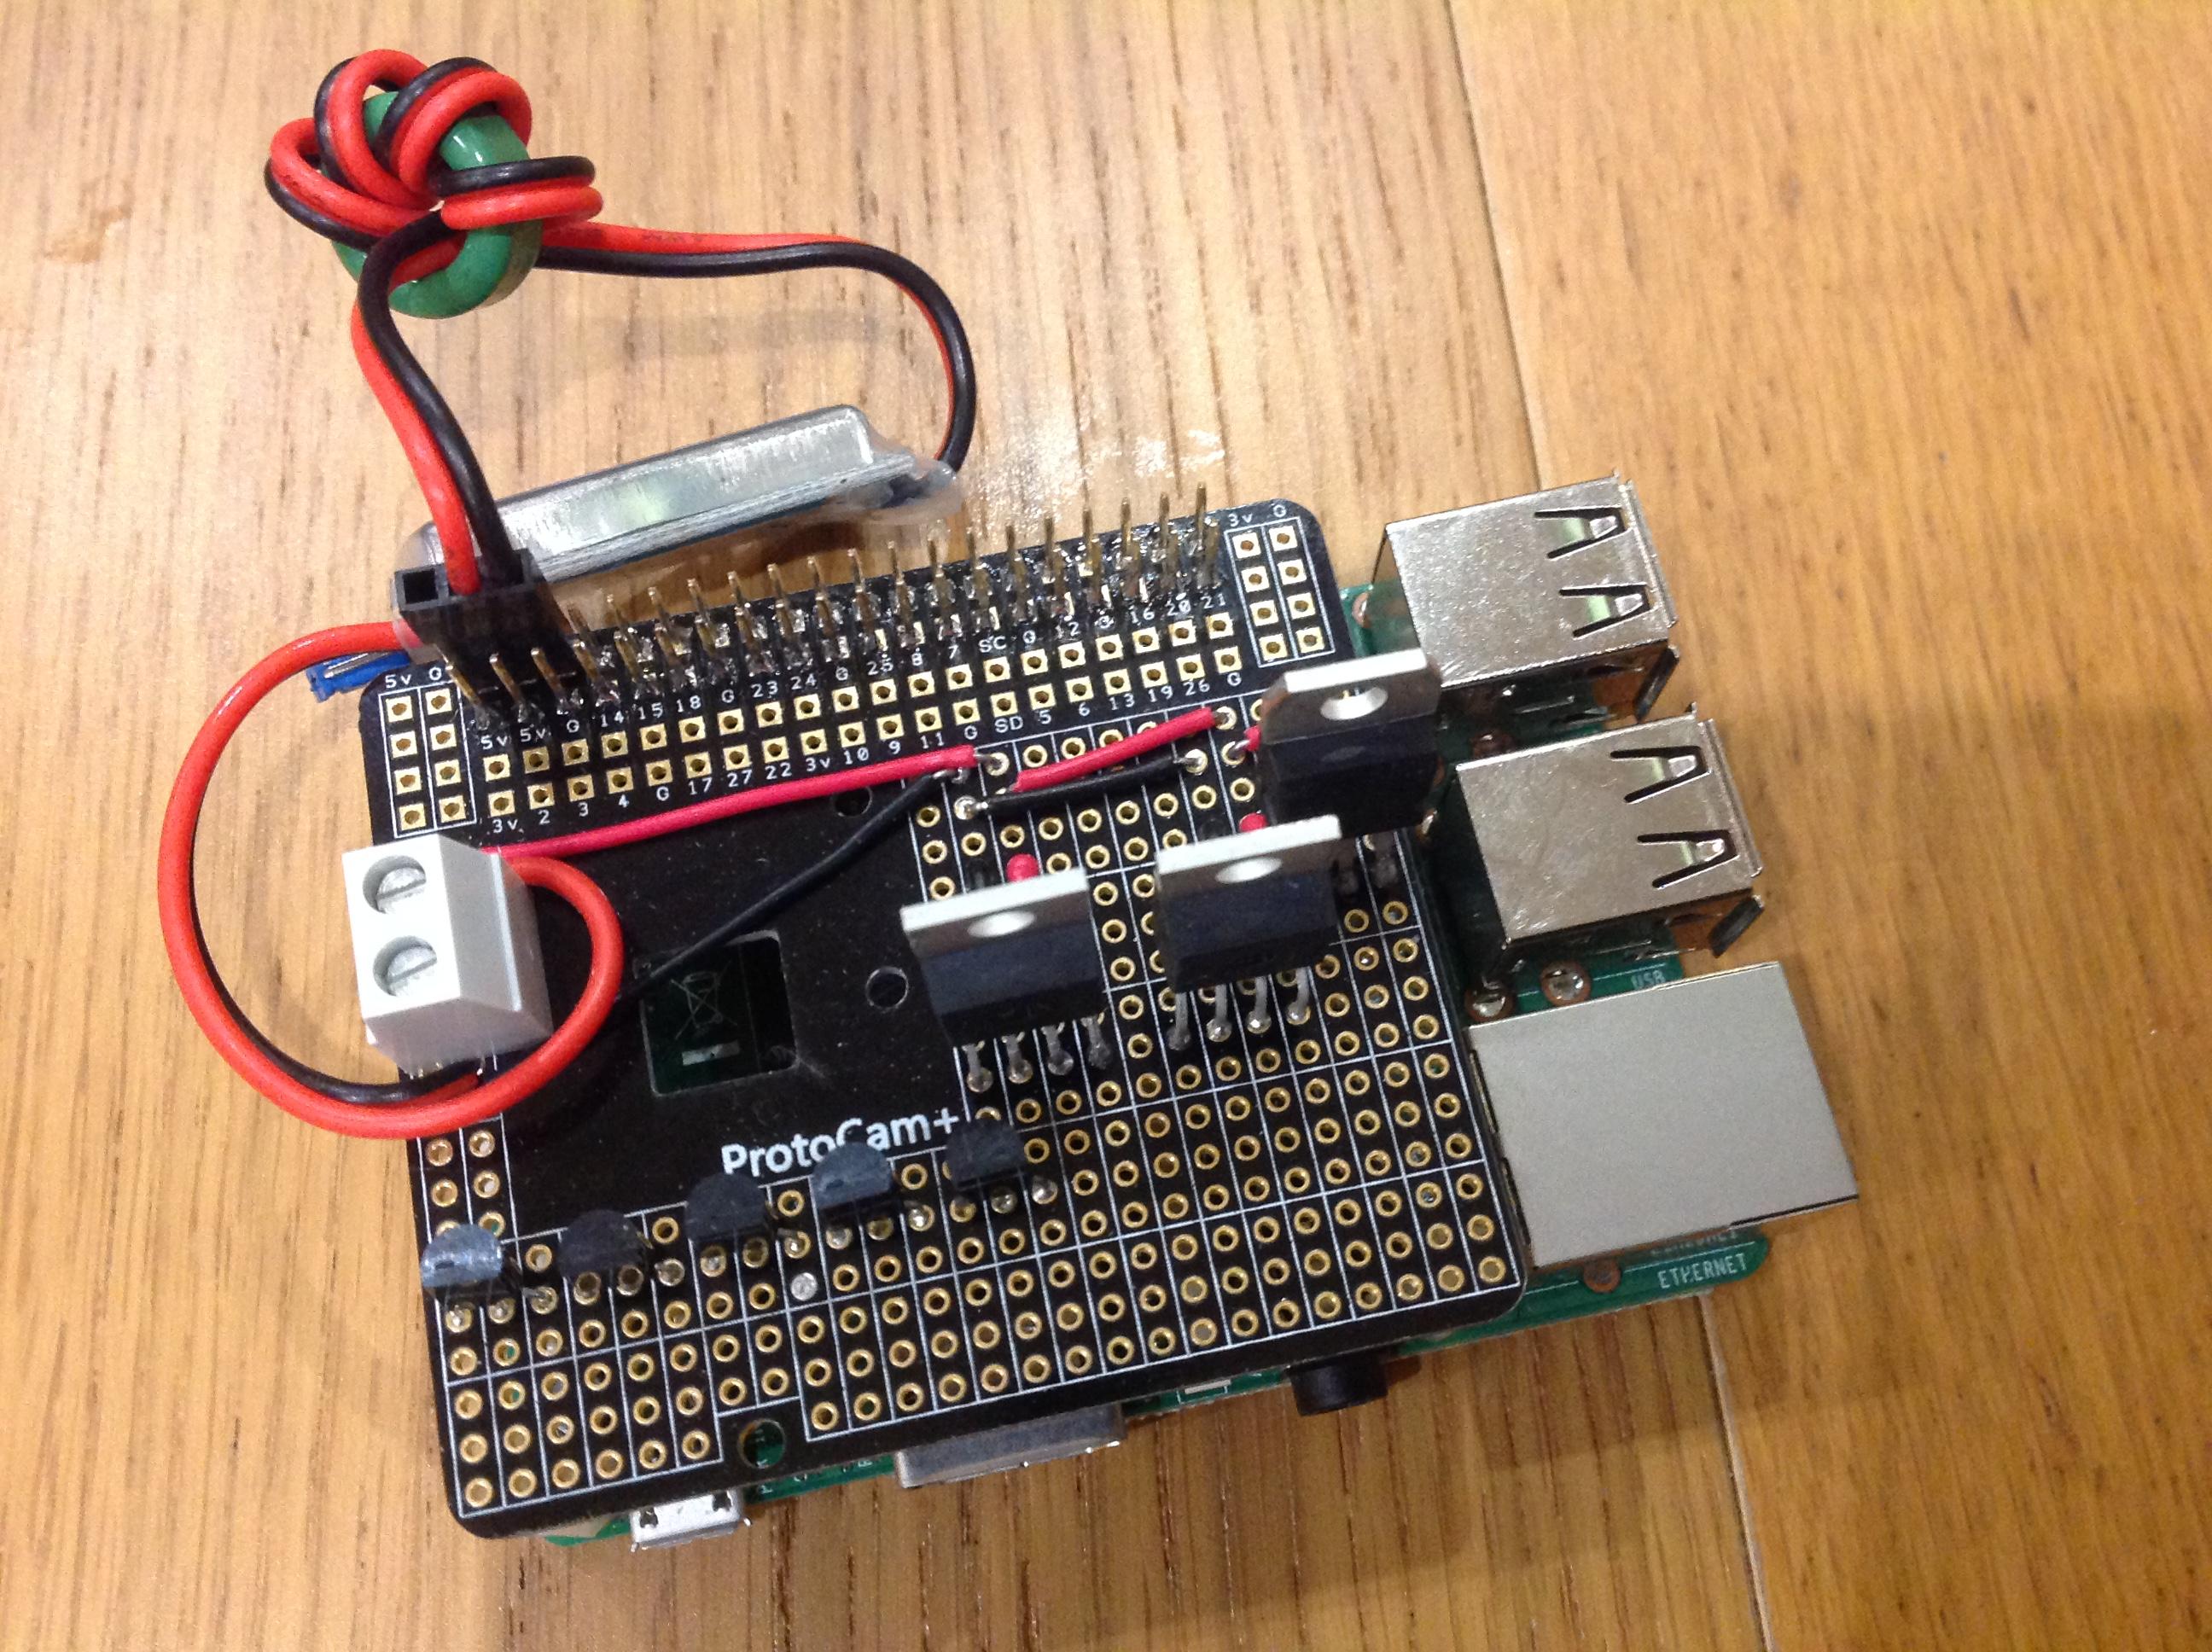 Protocam+ on Pi3